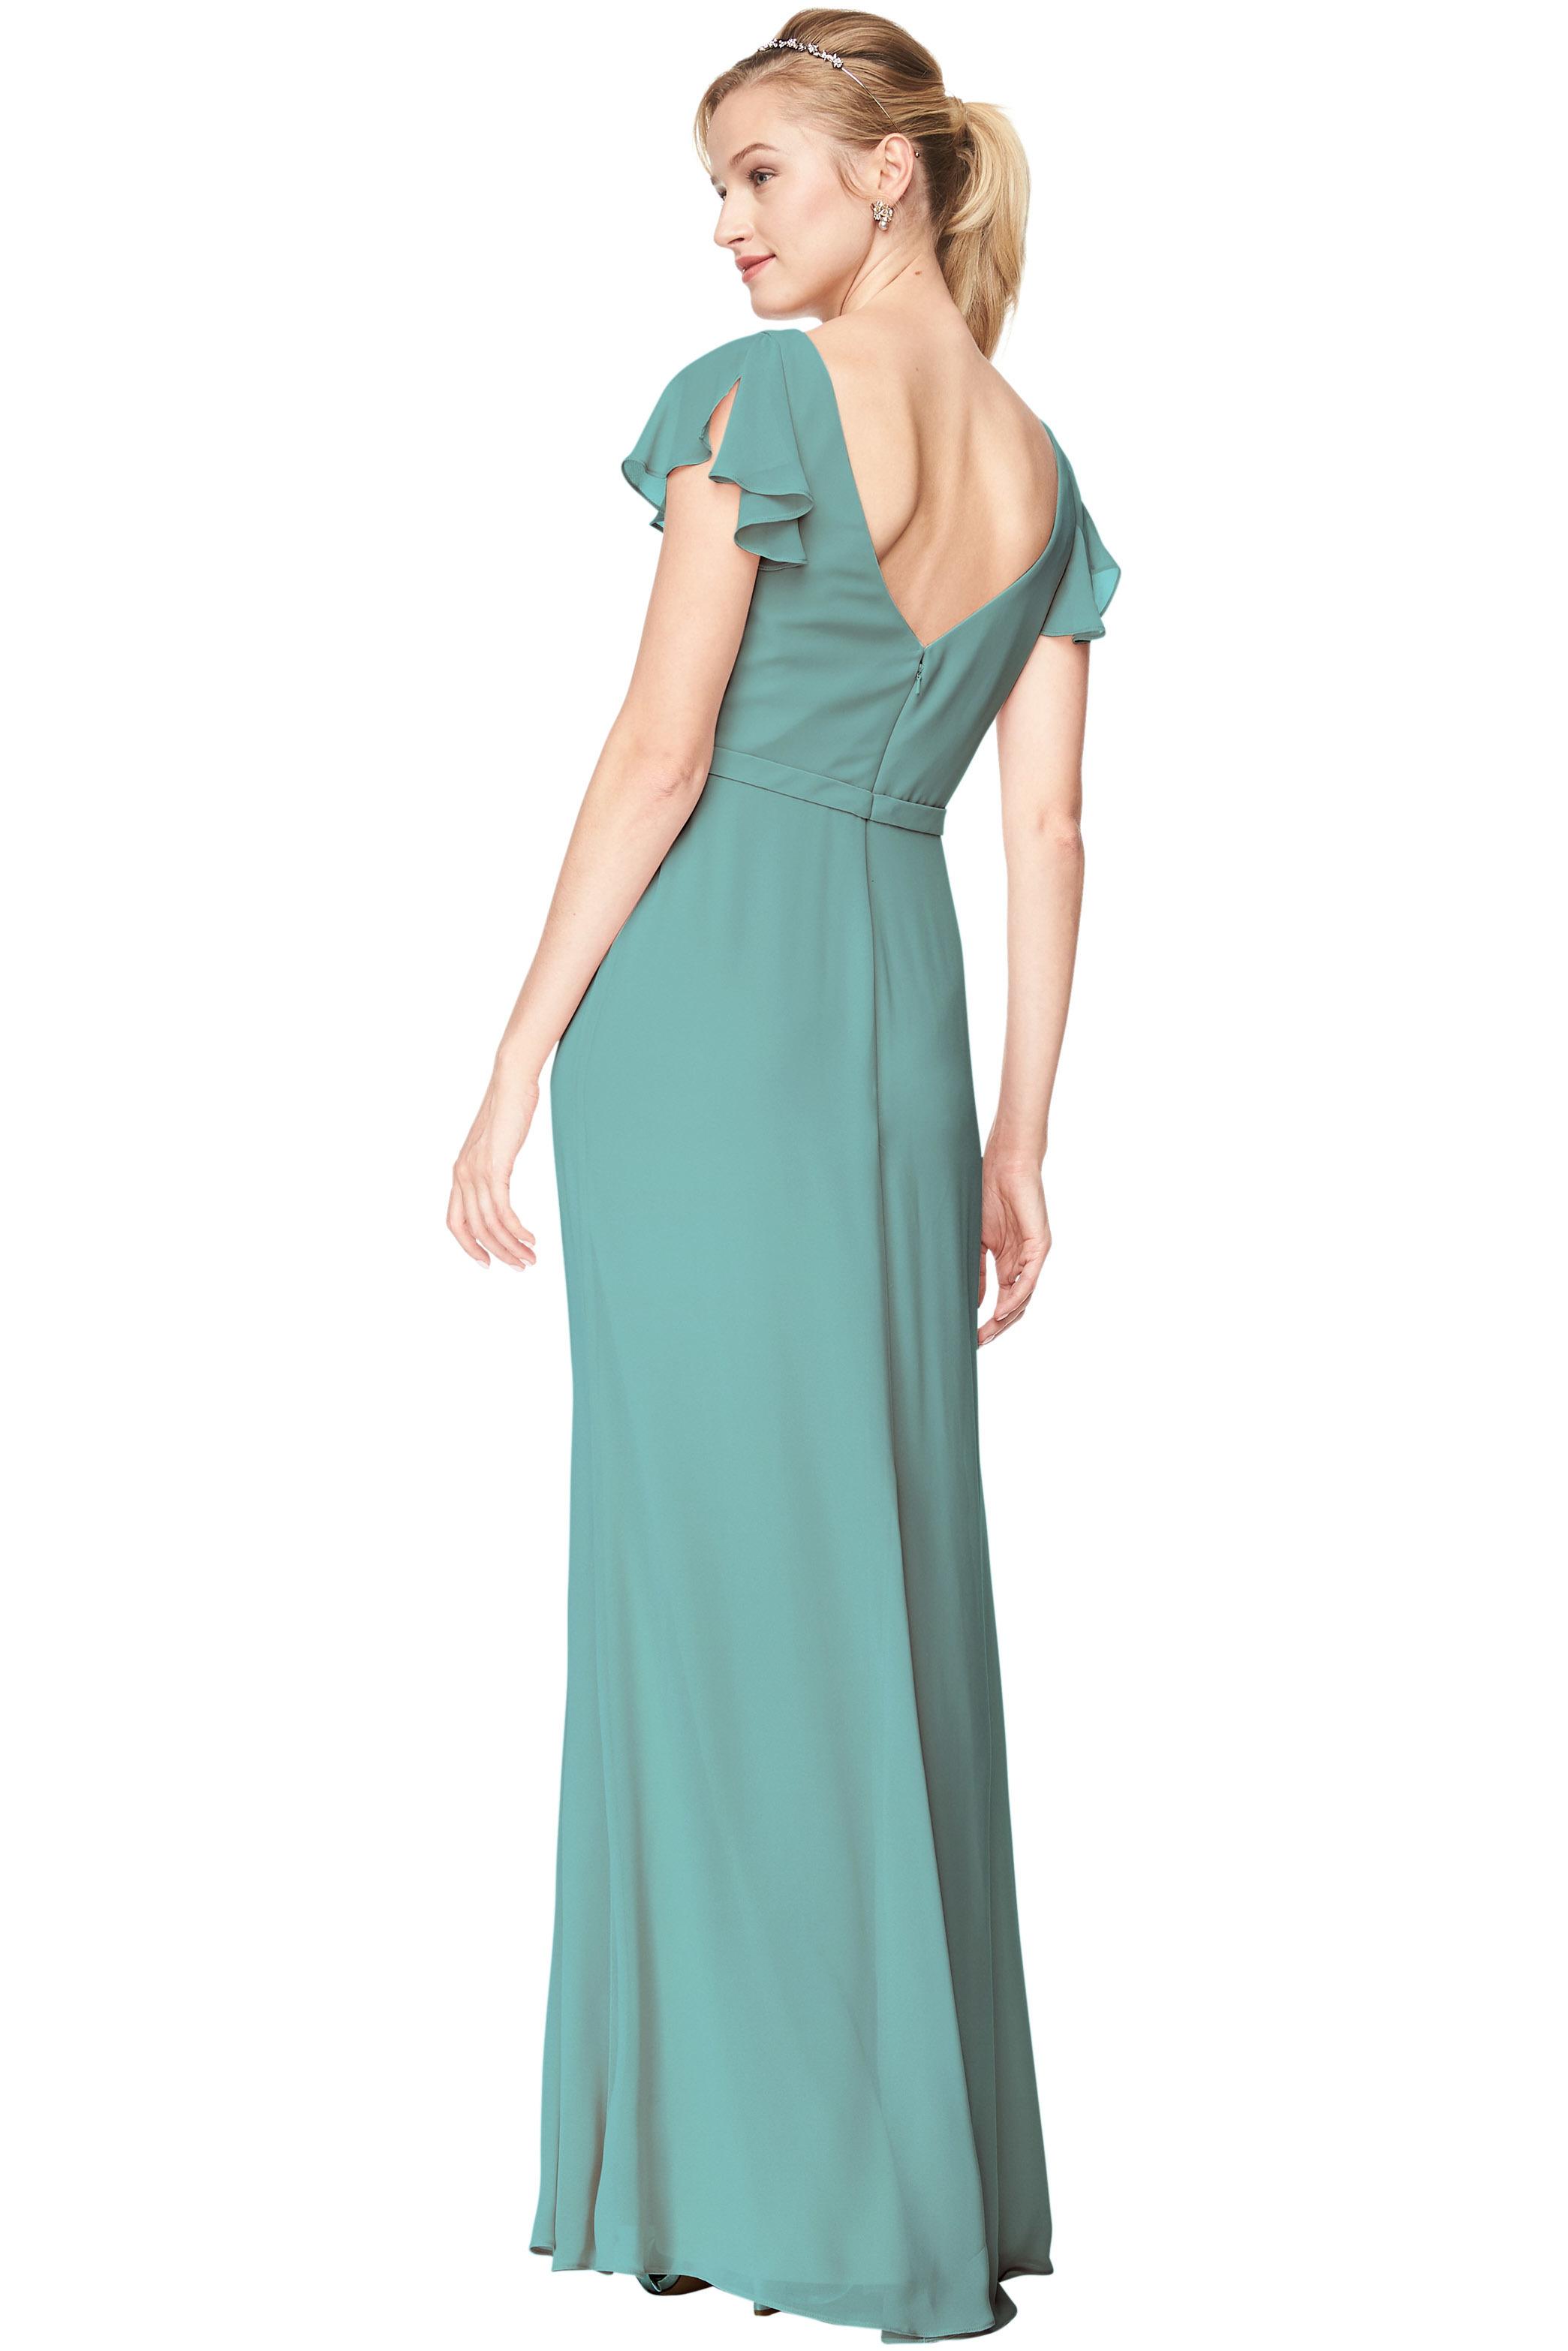 Bill Levkoff GLACIER Chiffon V-Neck, Cap Sleeve A-Line gown, $184.00 Back